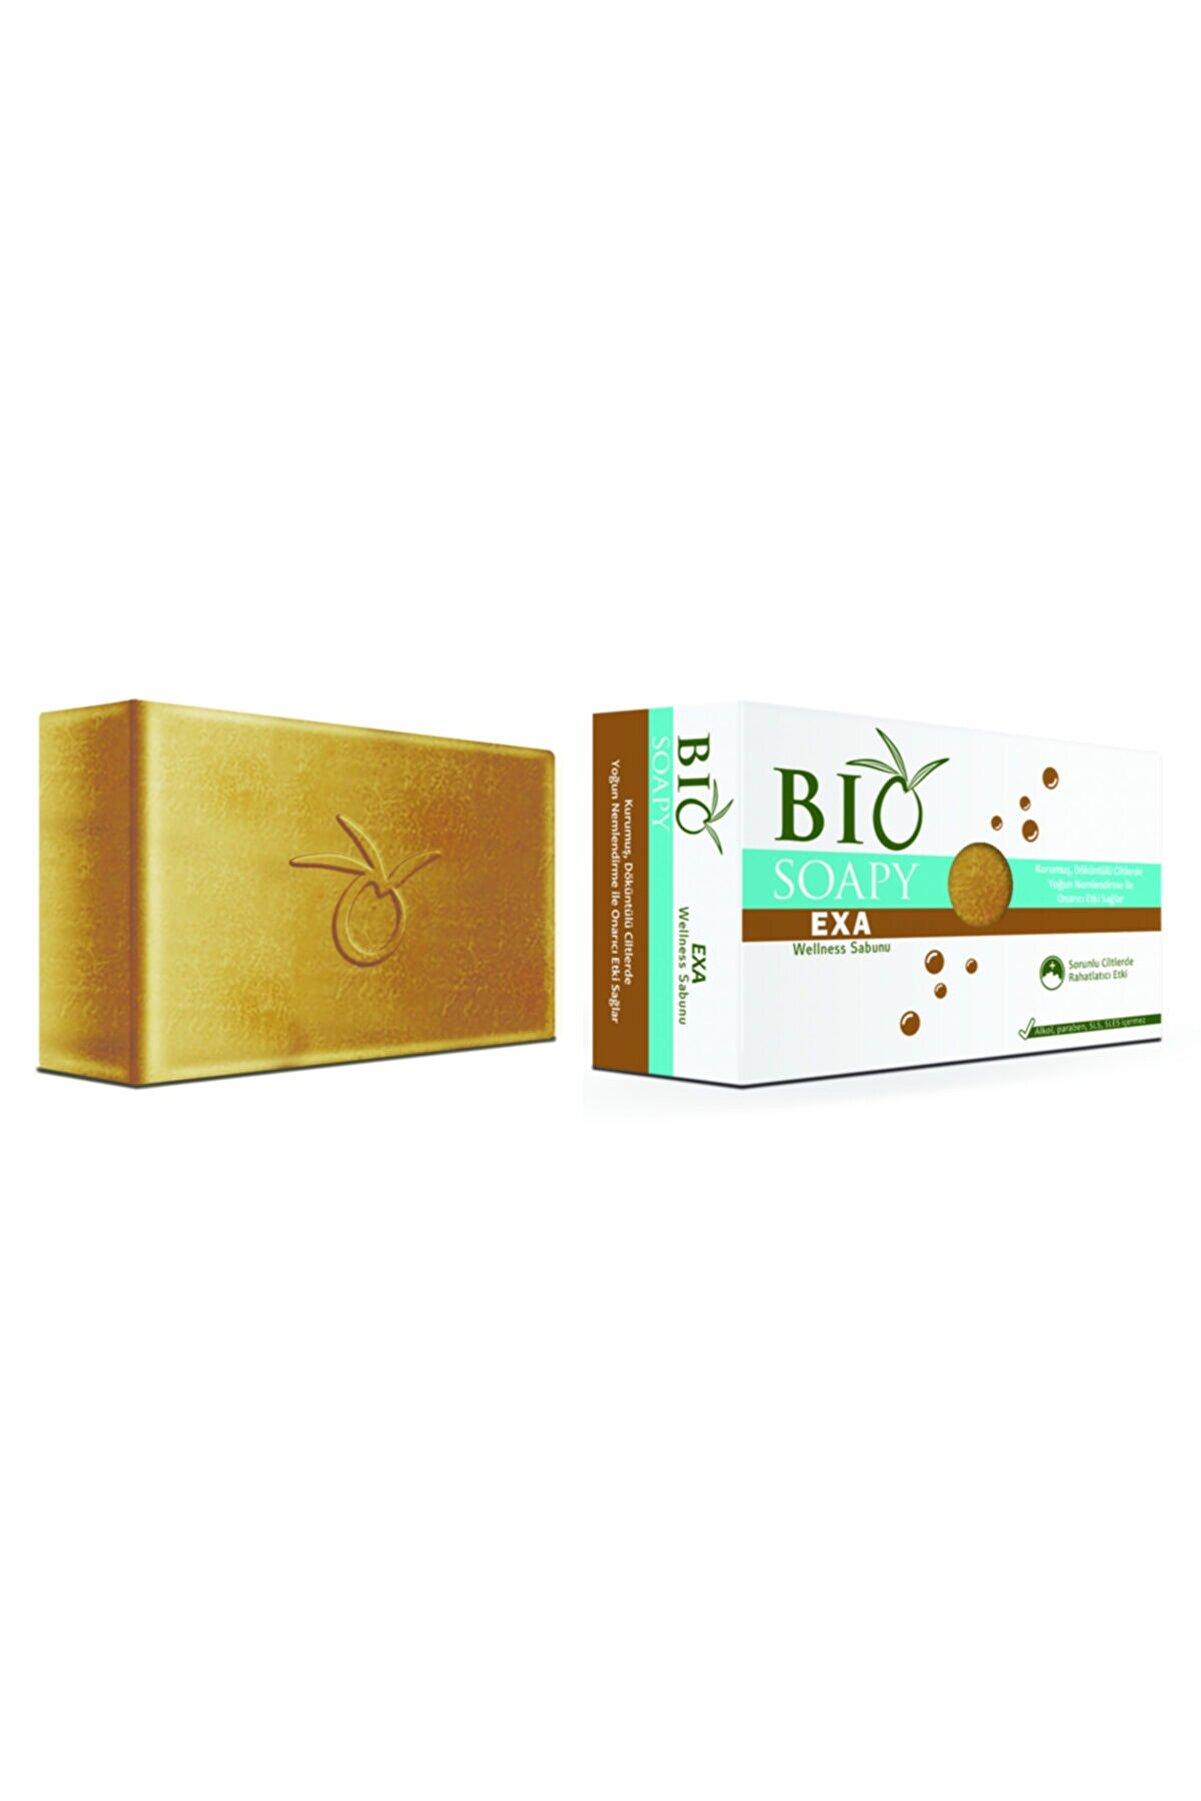 Biosoapy Doğal Exa Egzama Sabunu 100 Gr X 2 Adet (egzamada Doğal Terapi)